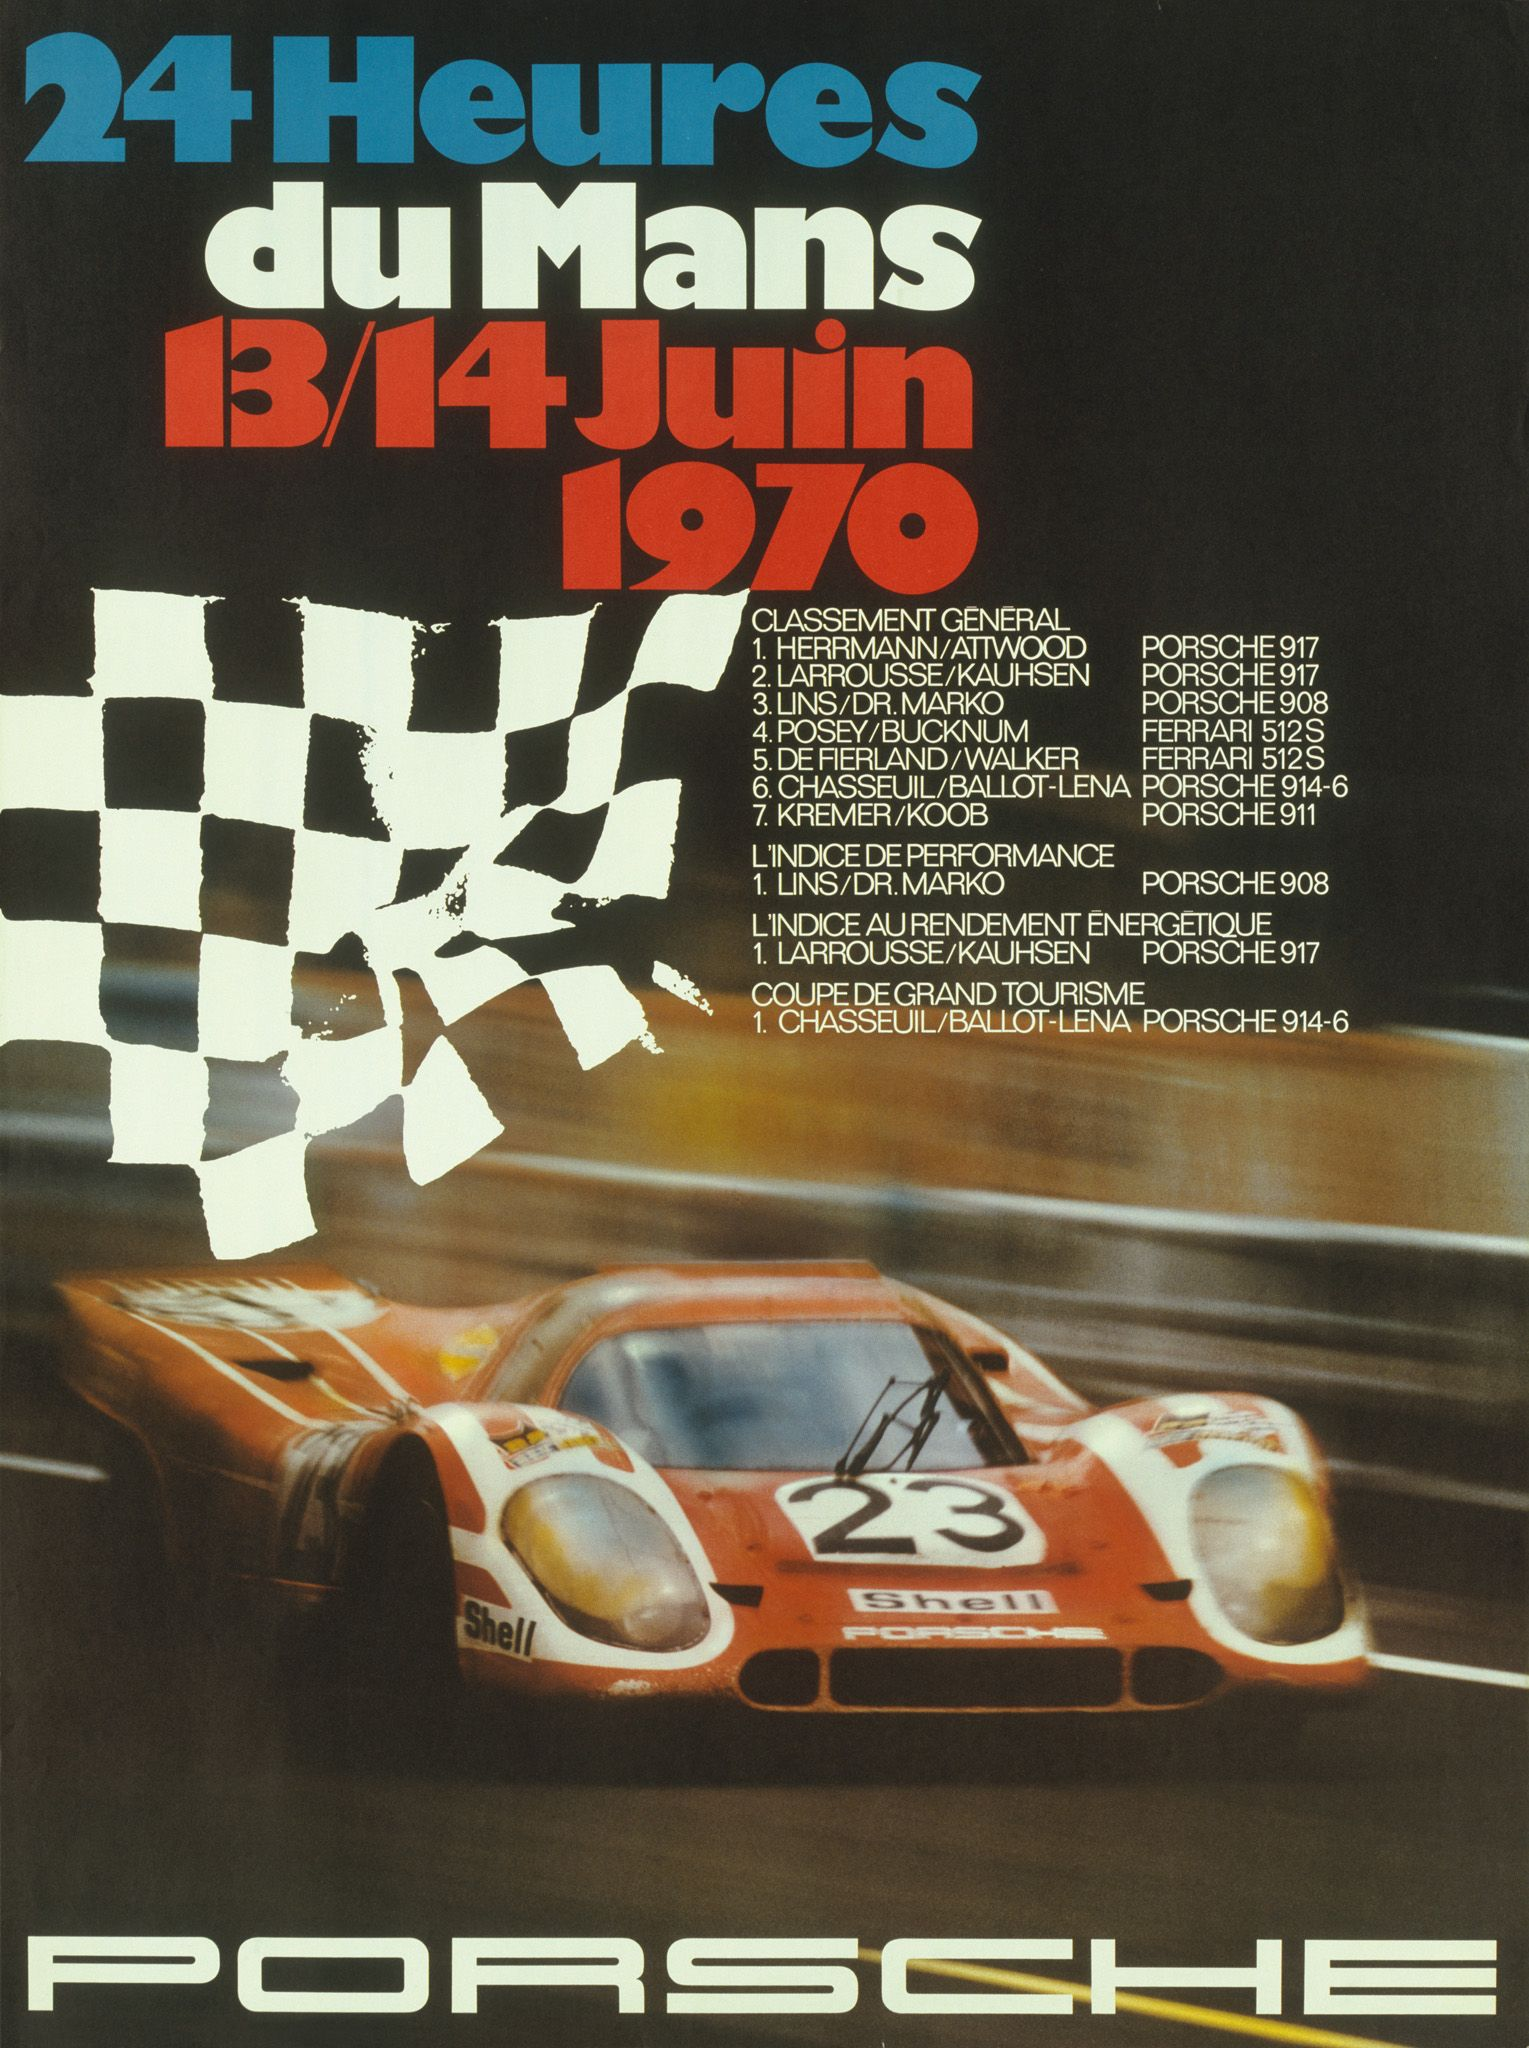 Le Mans 1970 Porsche 917